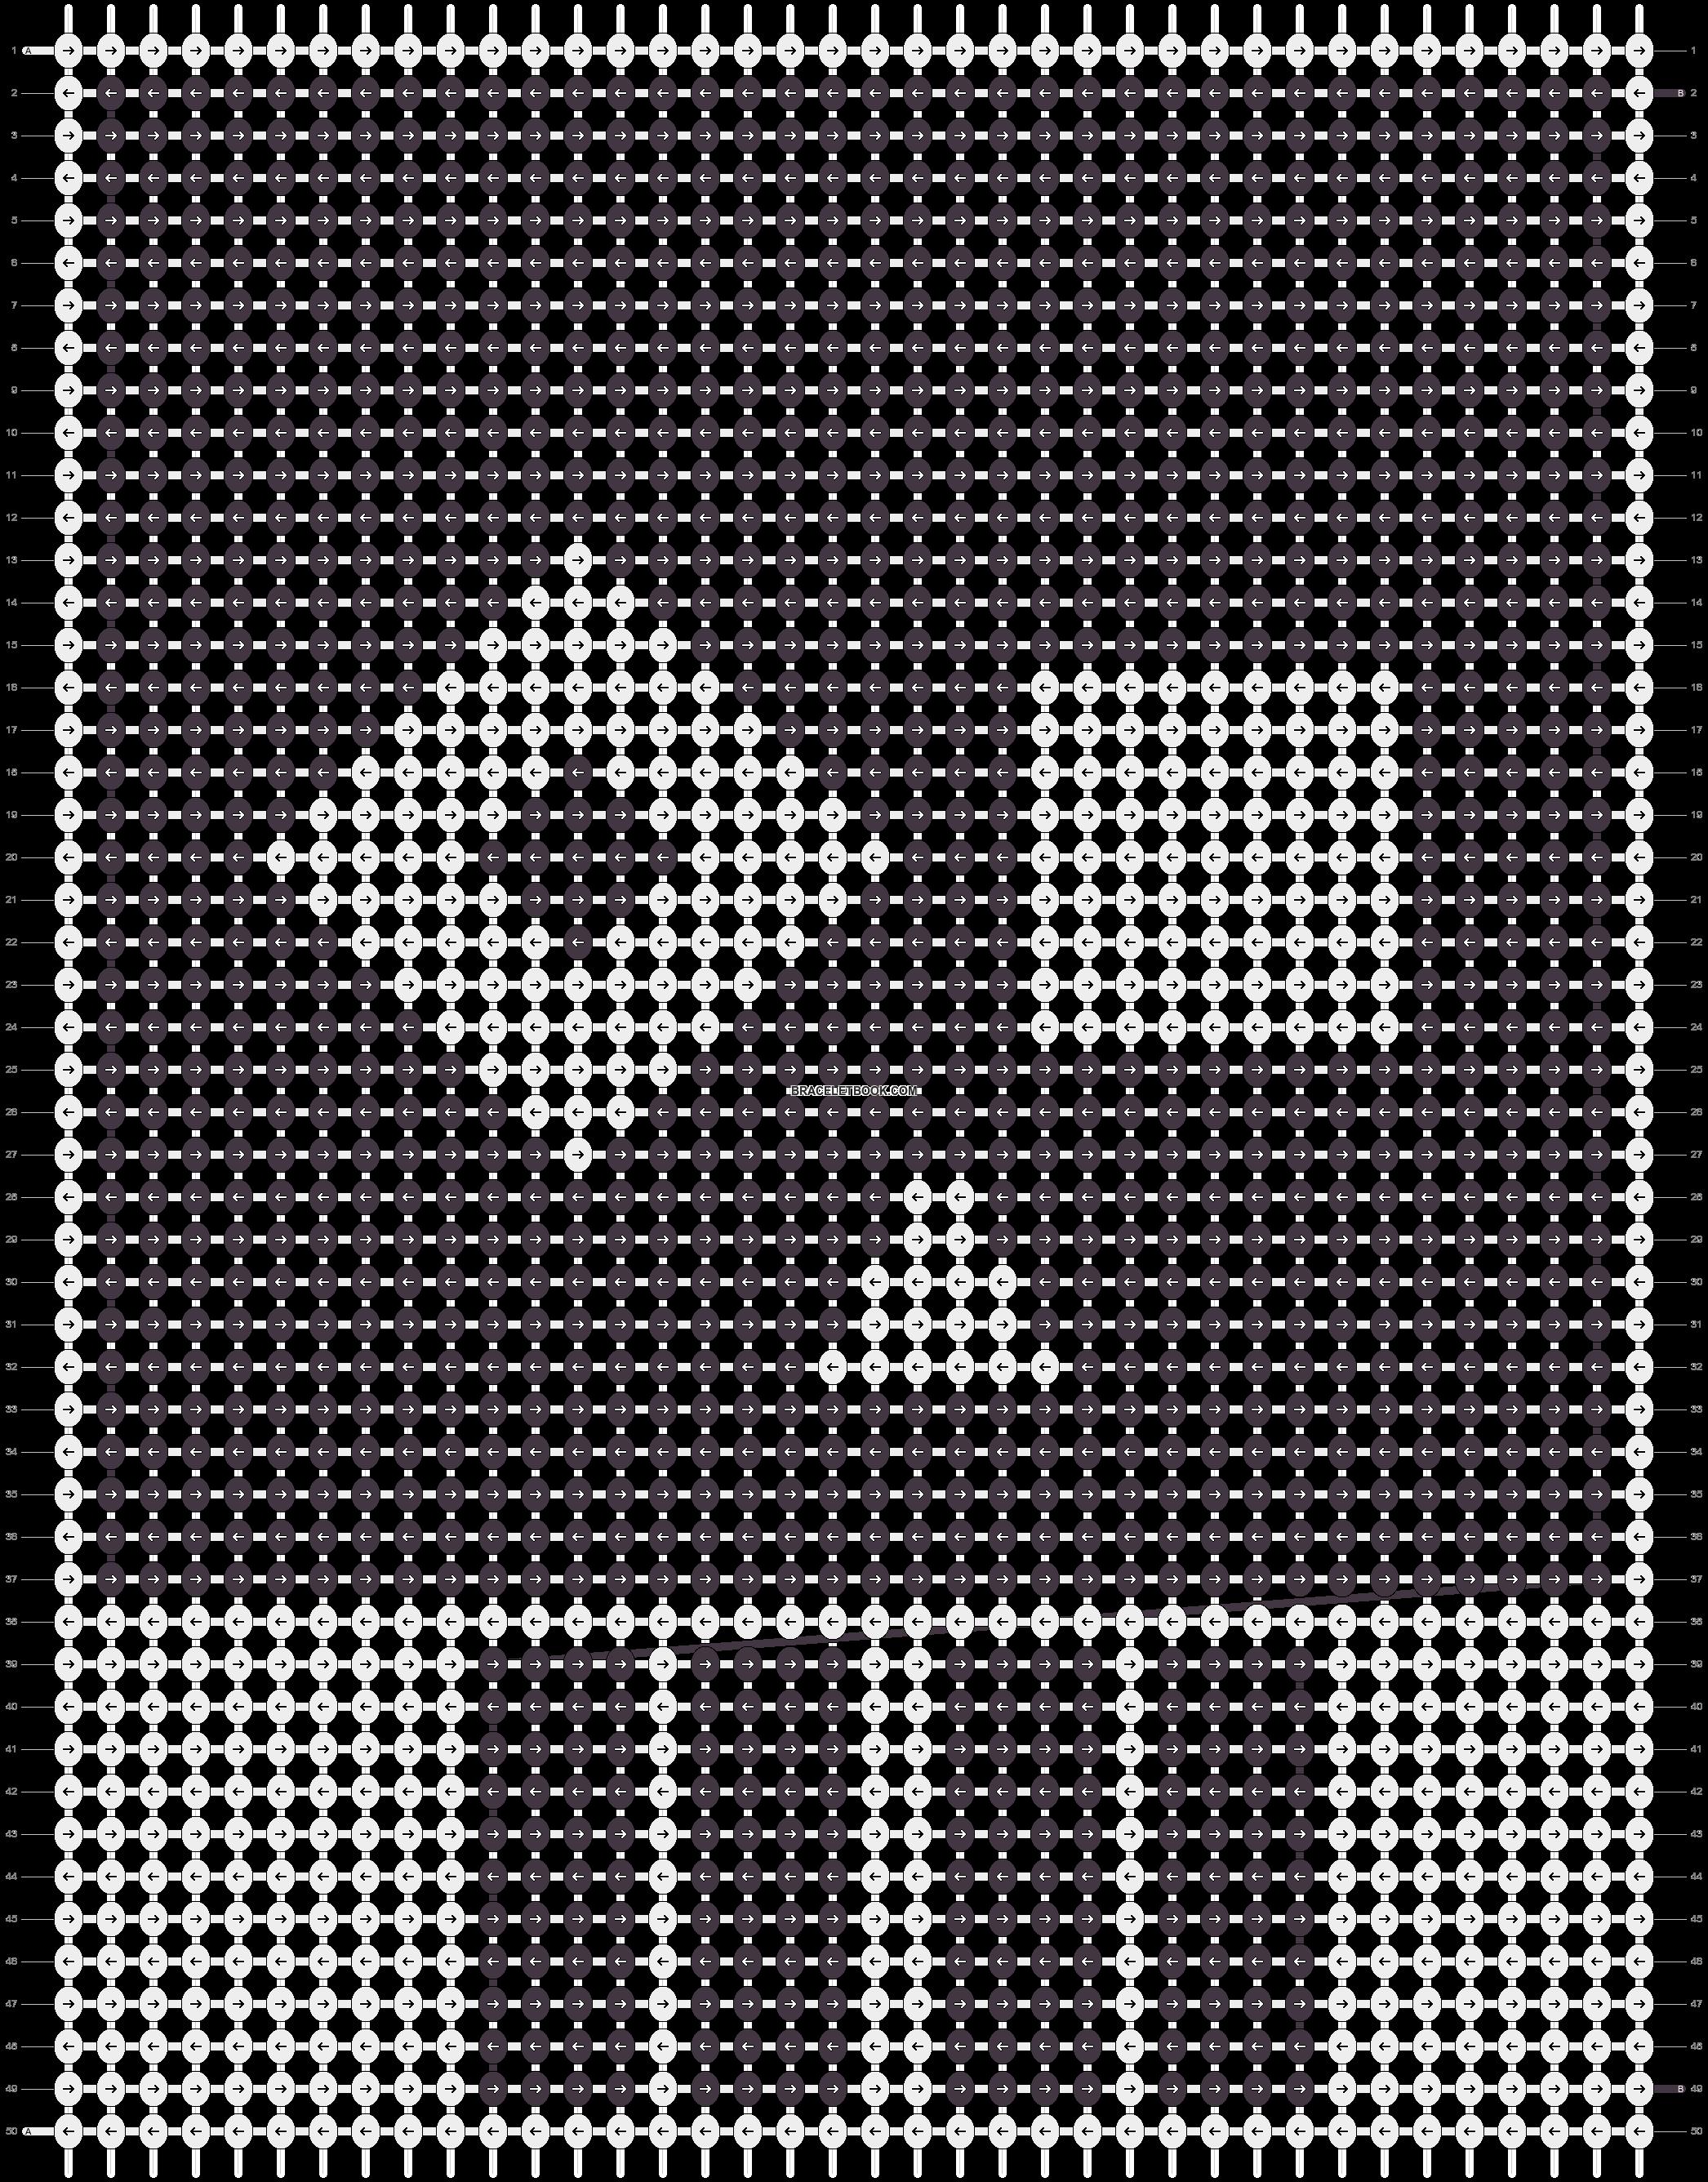 Alpha Pattern #22180 added by toribug11